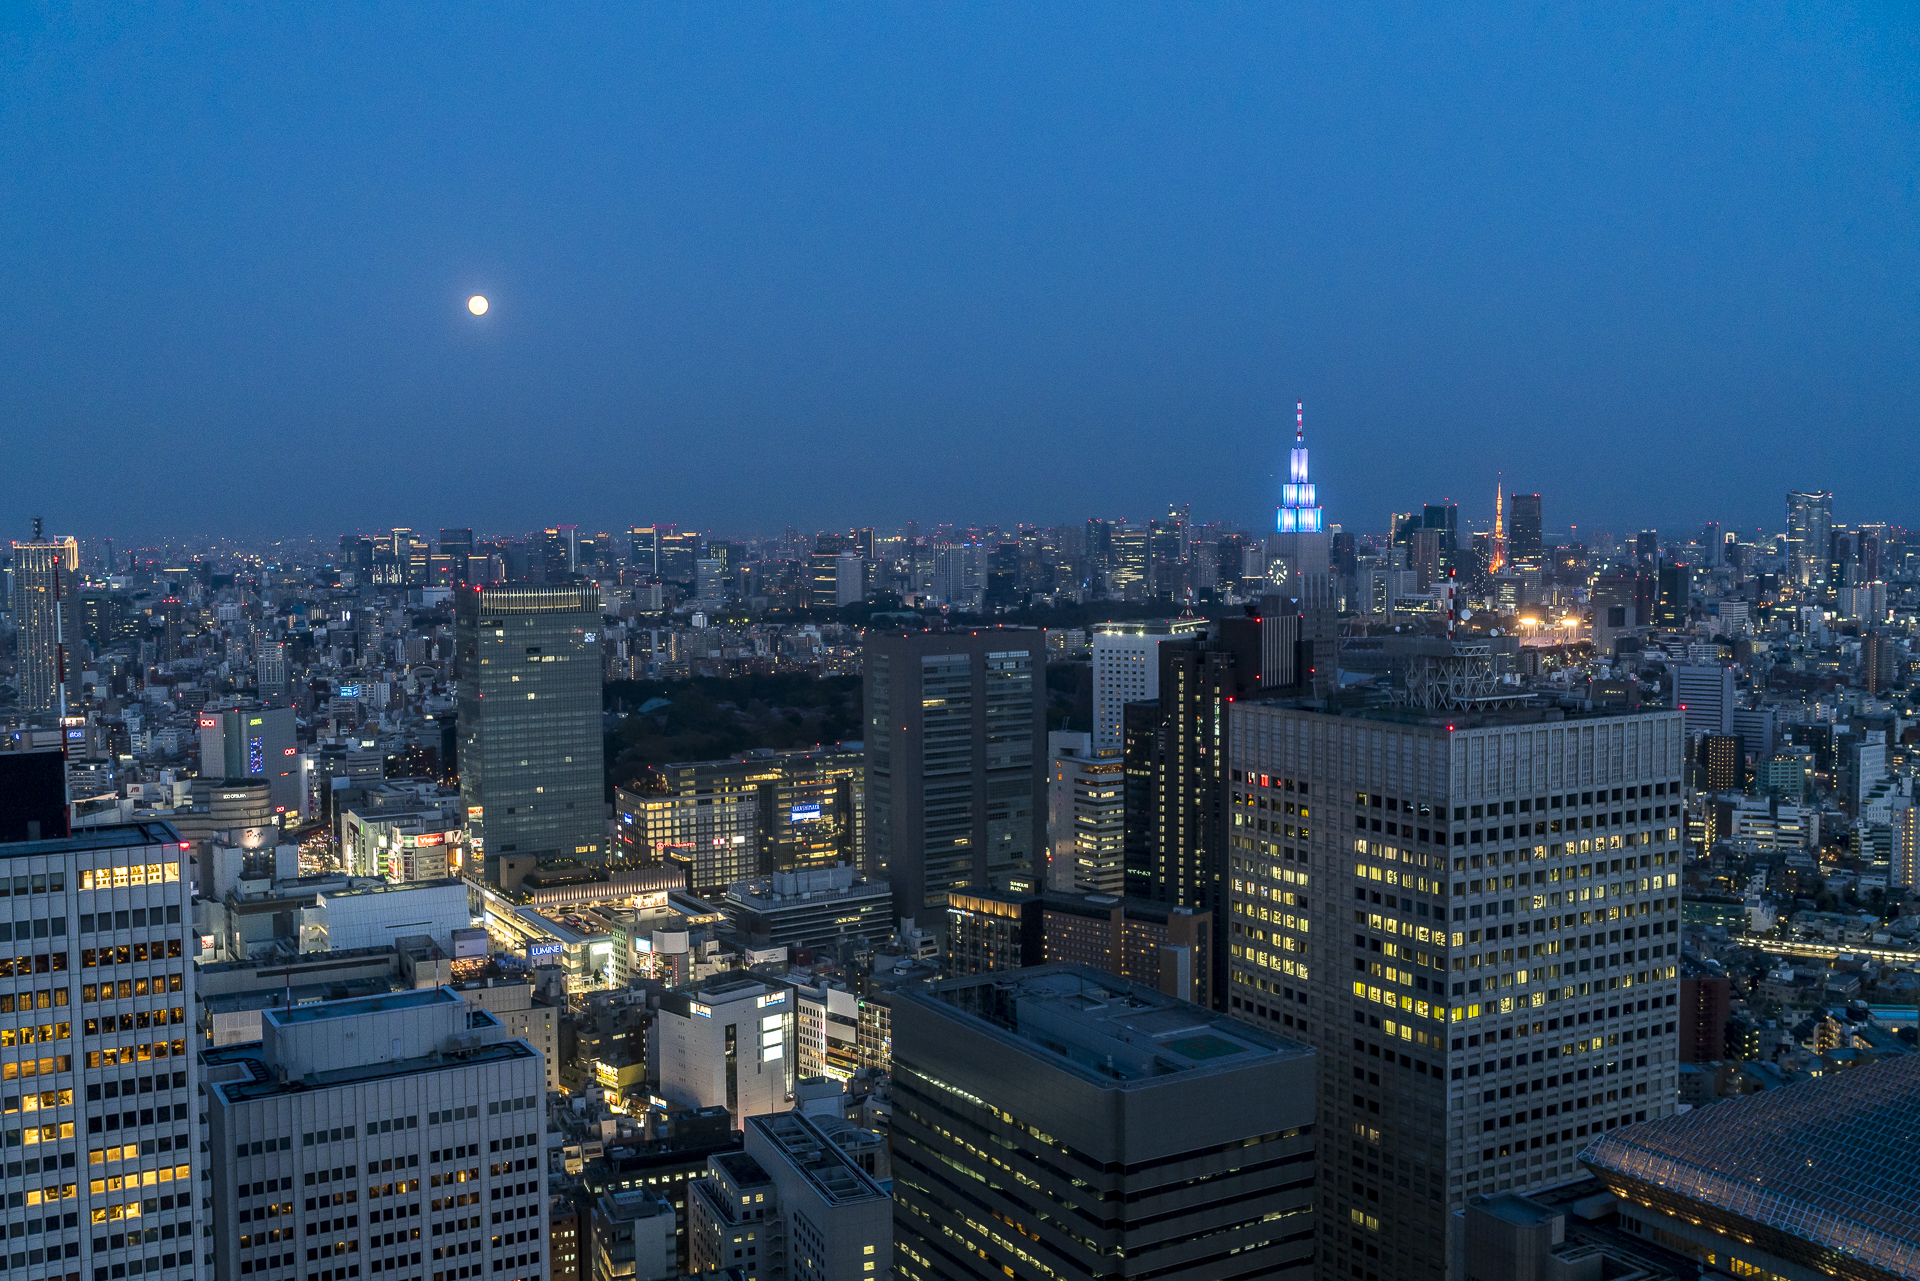 Tokyo Metropolitann Fovernment Building